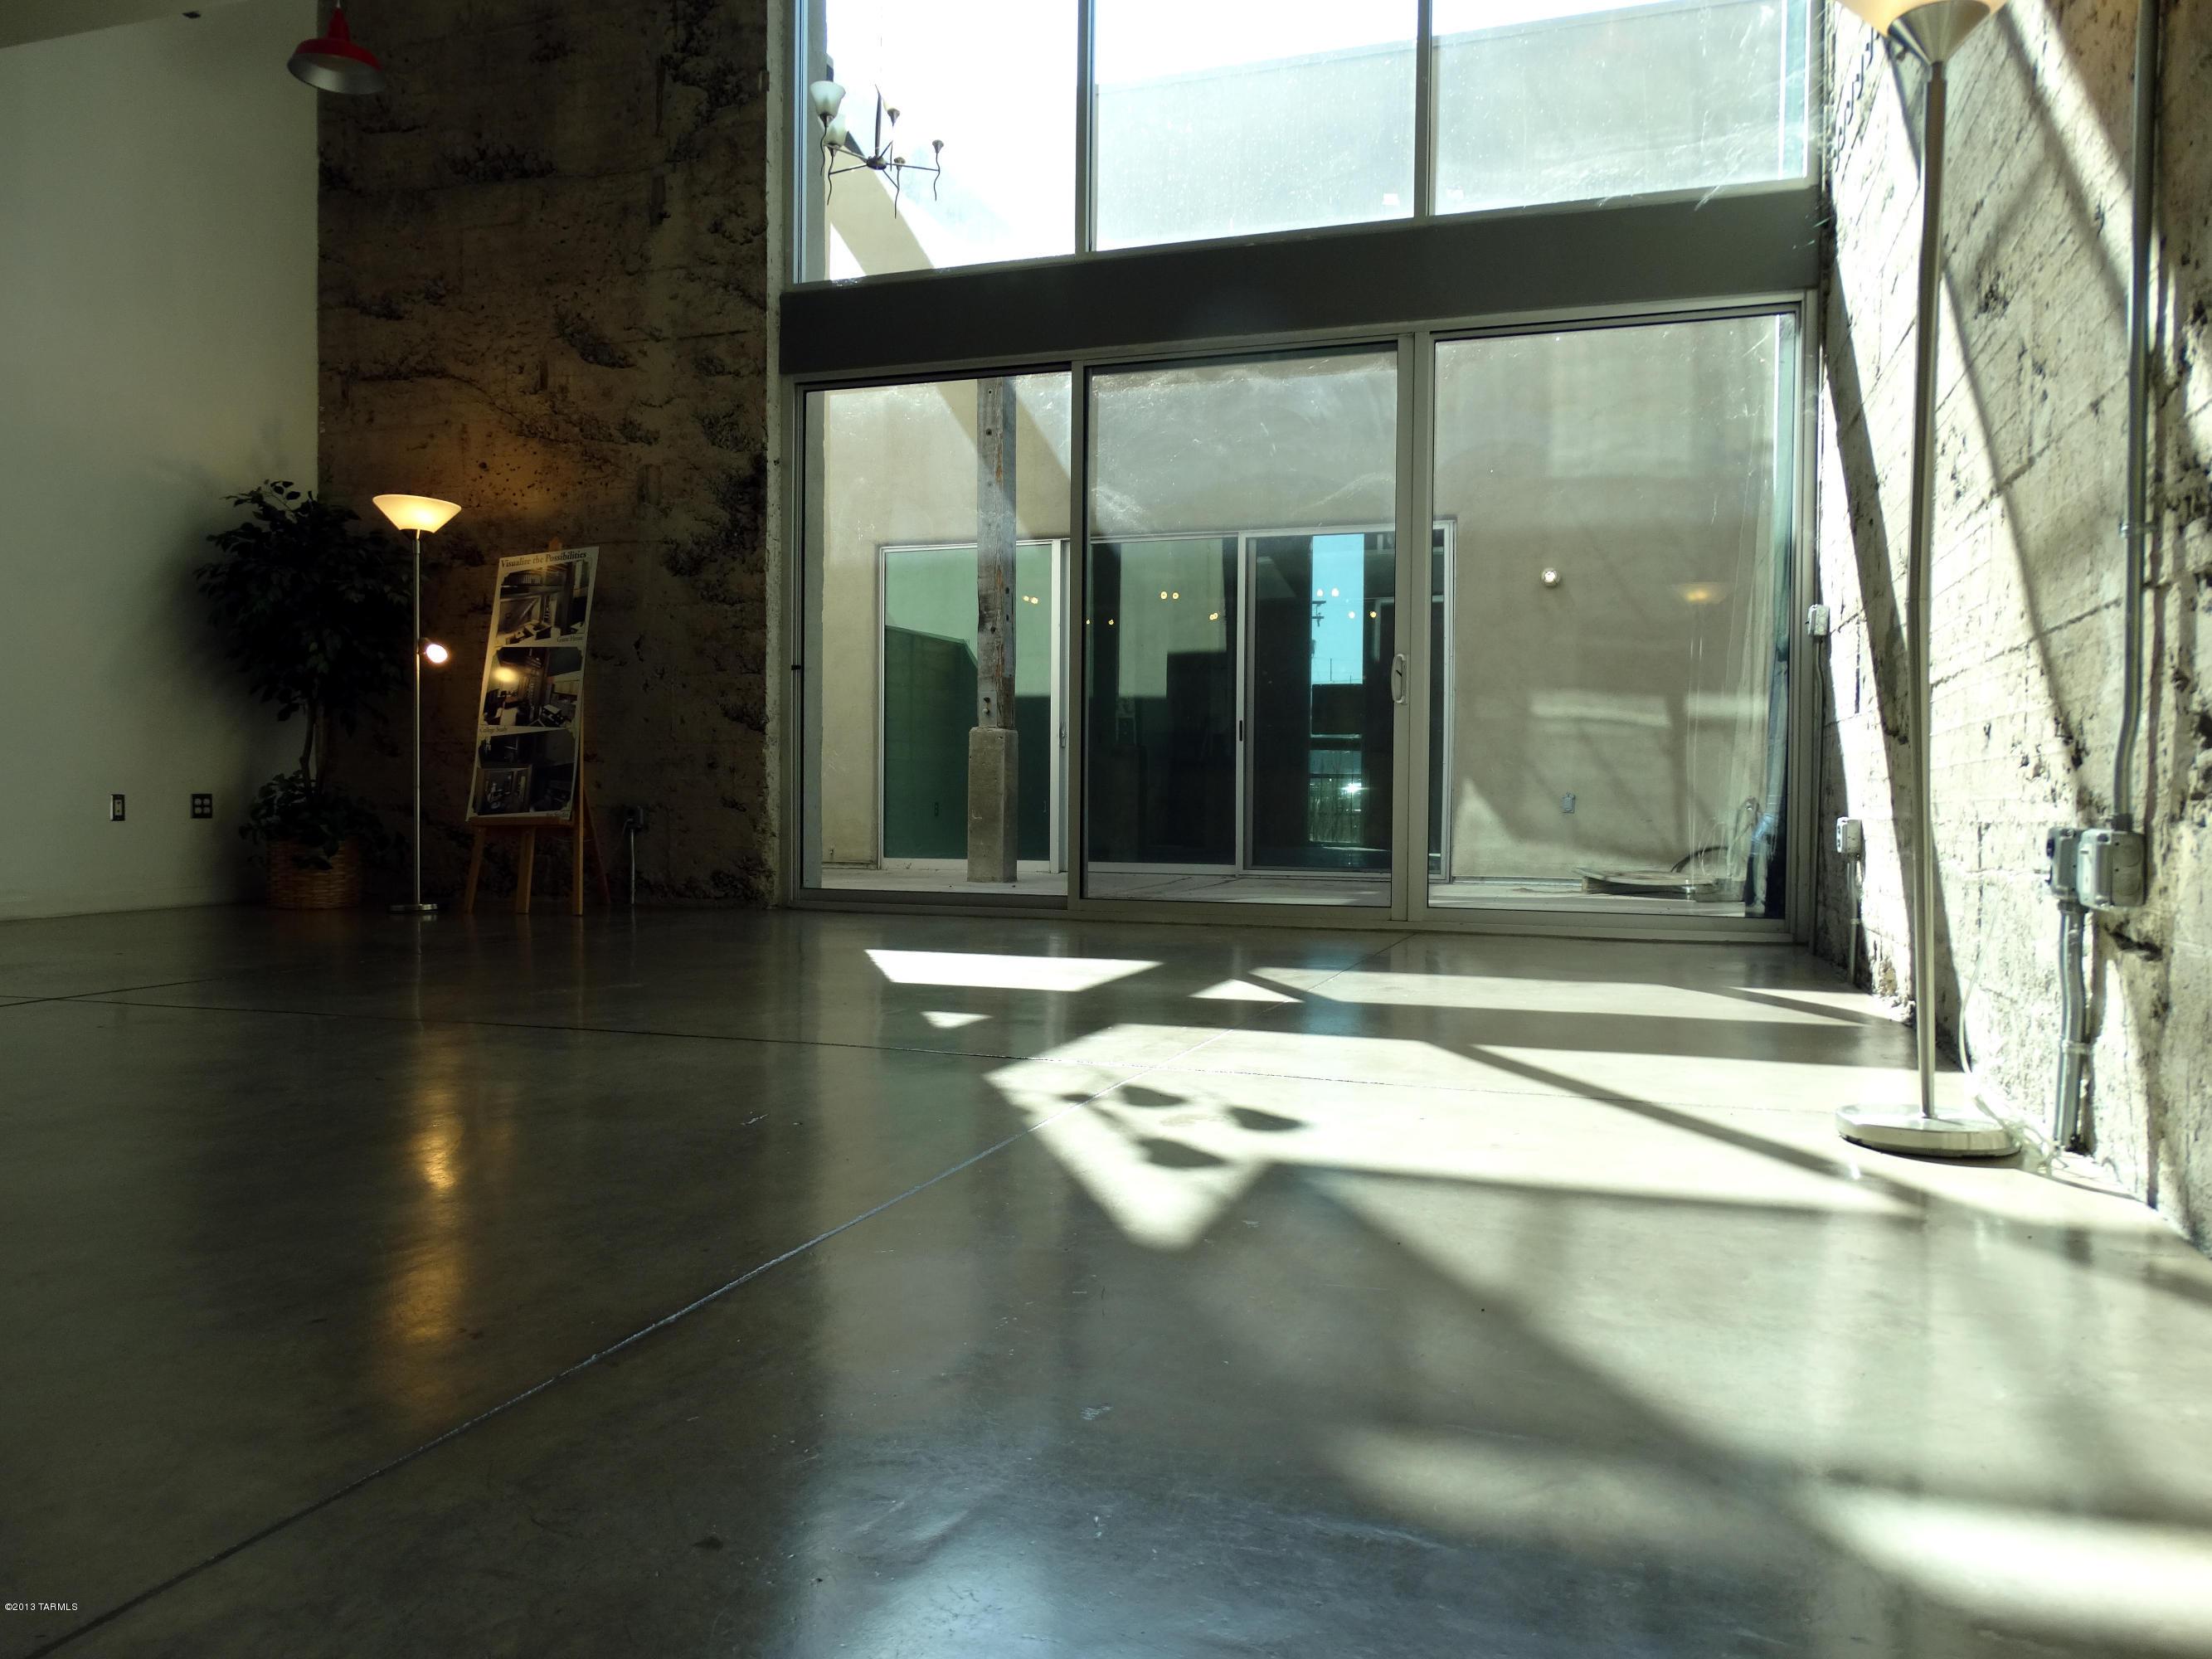 Miraculous Ice House Loft 111 Near Downtown Tucson Az Is For Sale Download Free Architecture Designs Fluibritishbridgeorg